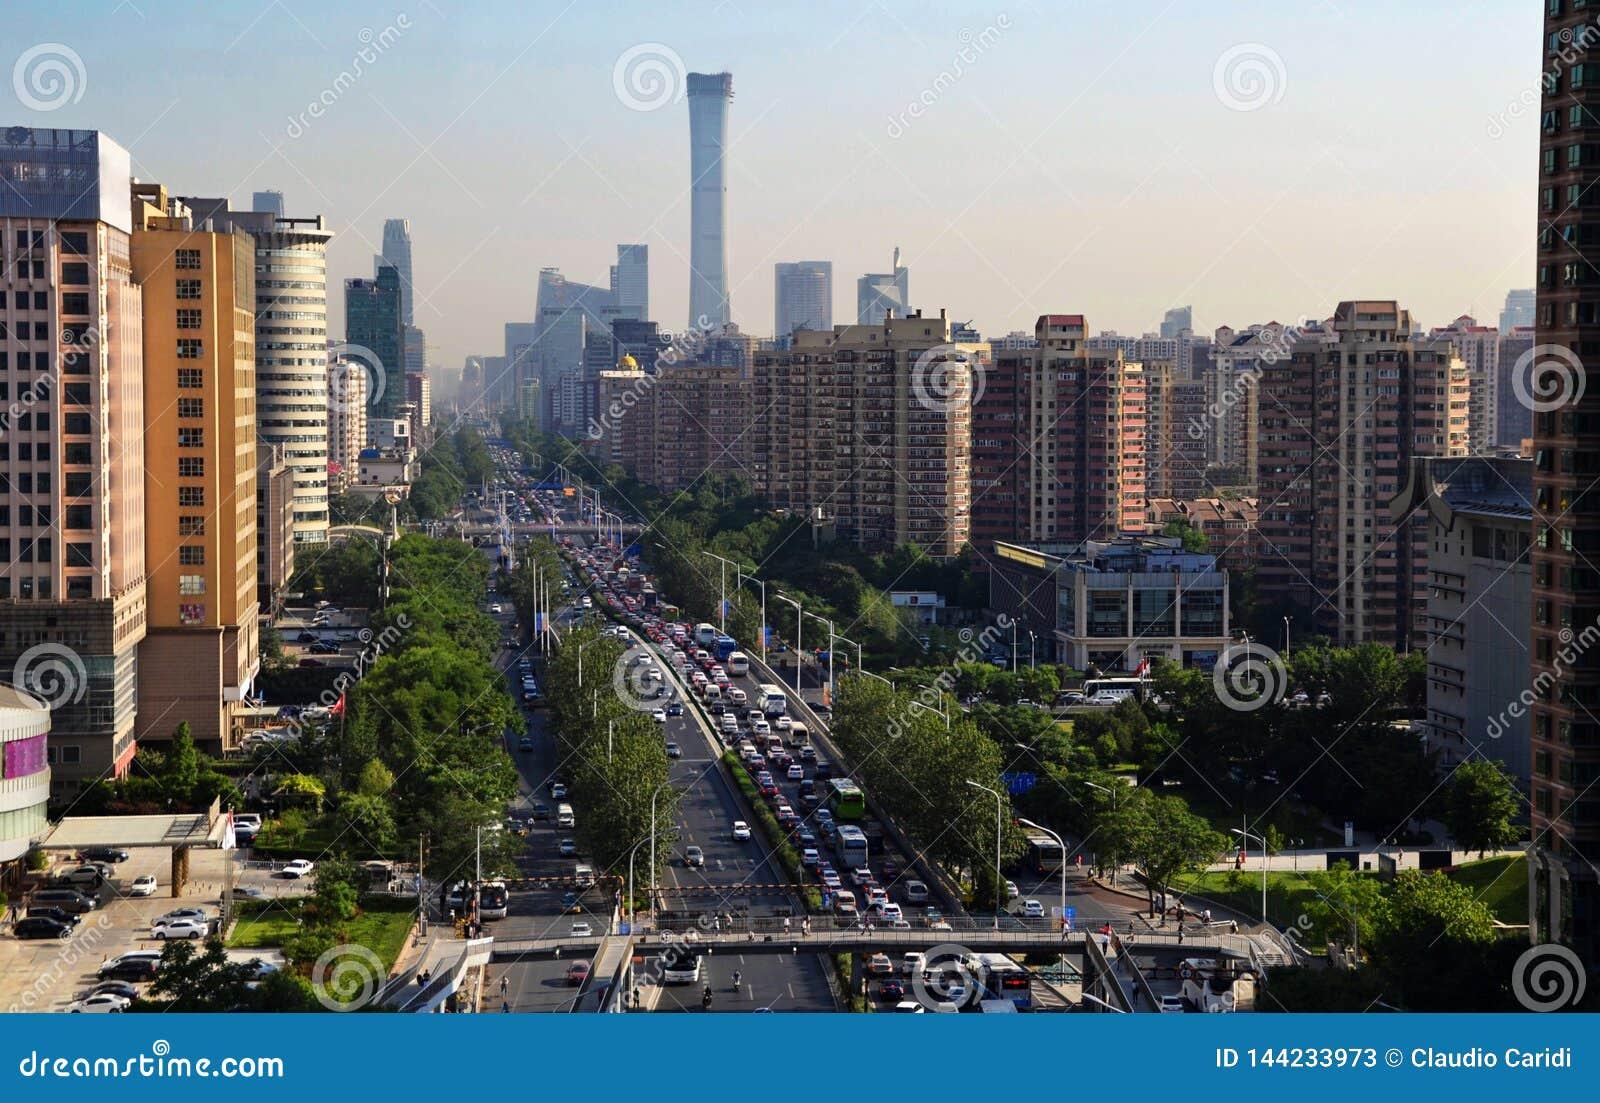 Paysage de ville moderne, P?kin, Chine